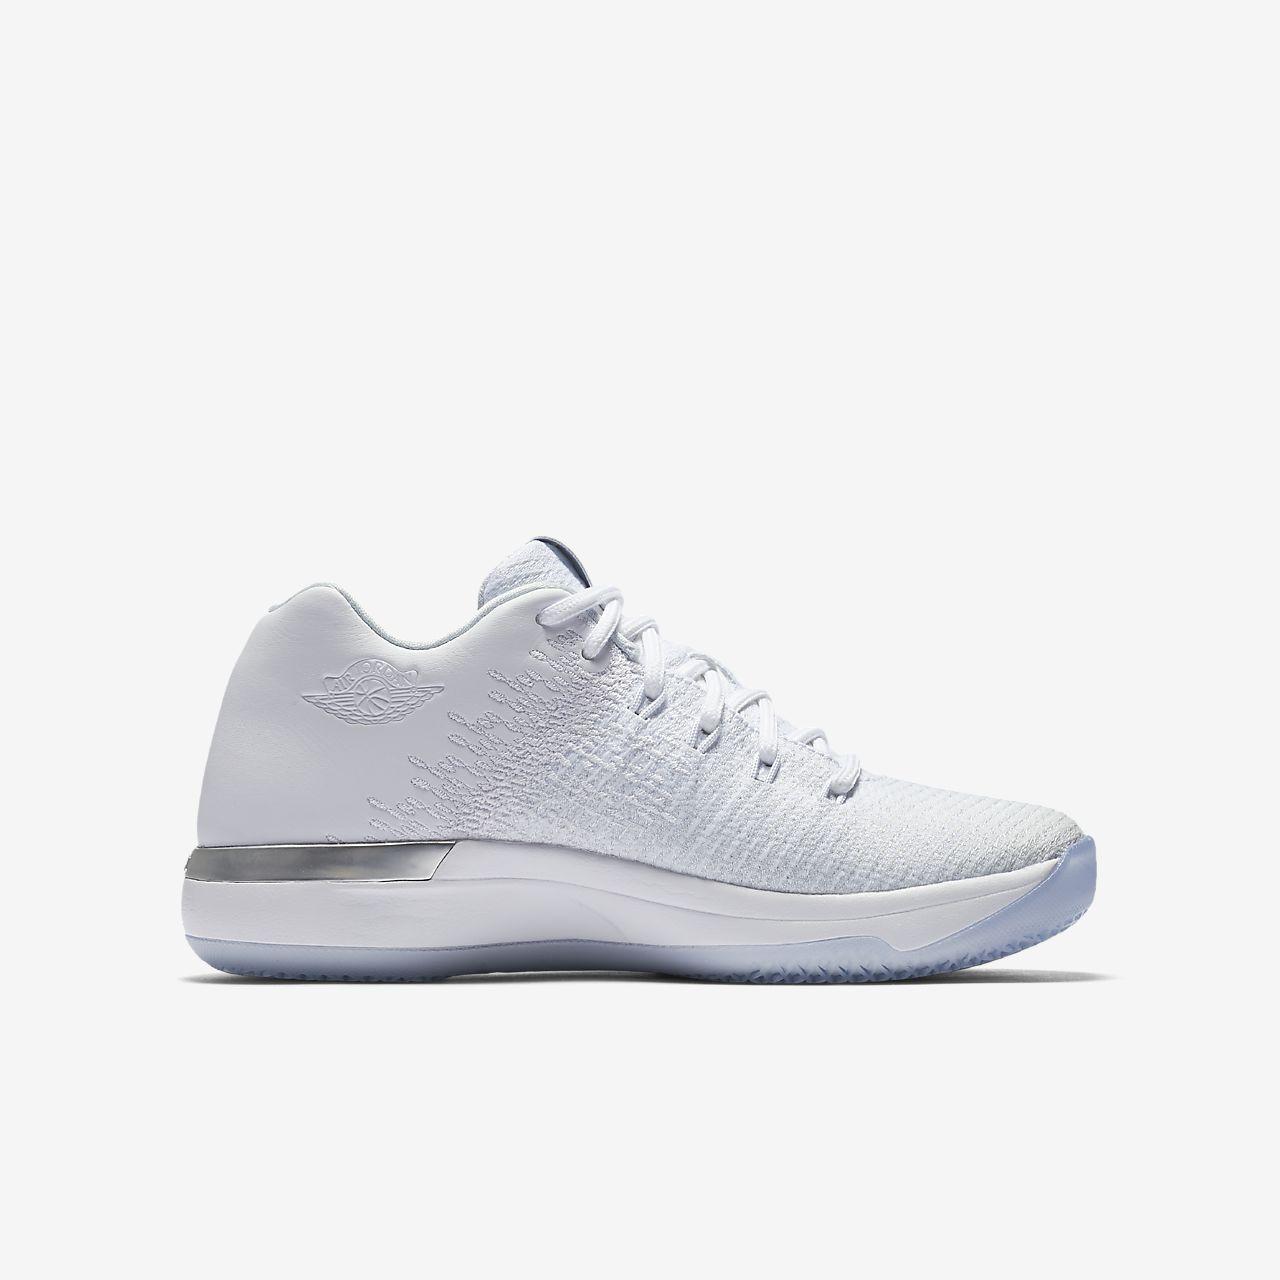 jordan low top basketball shoes nz